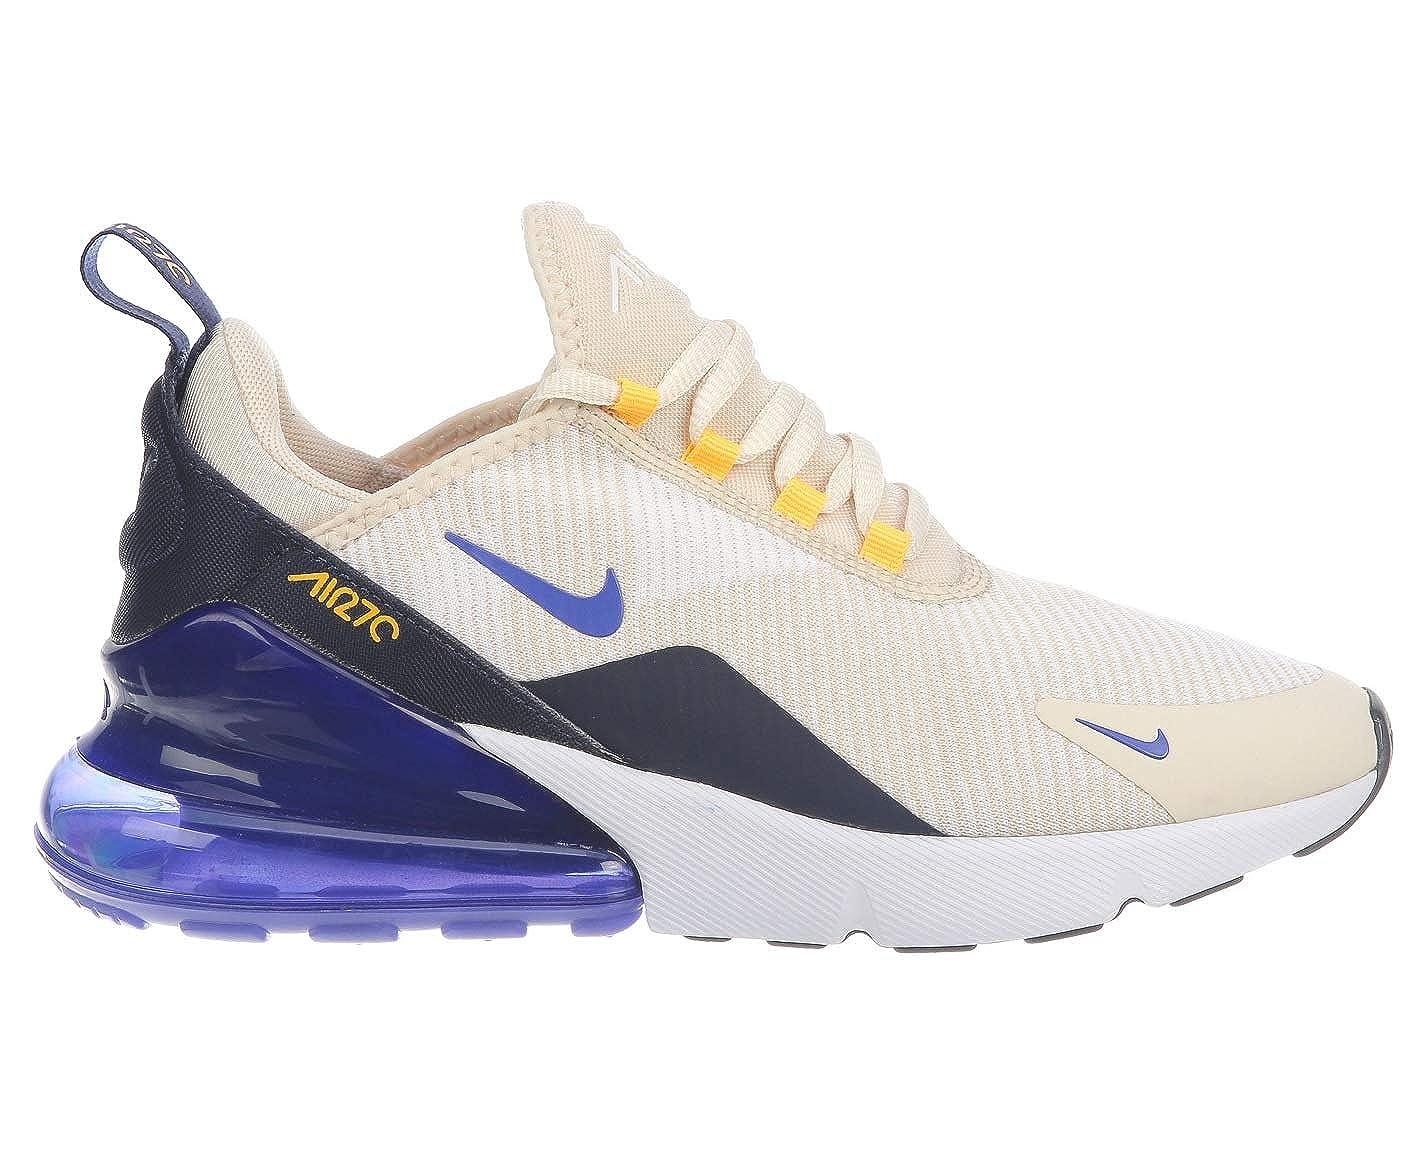 Buy Nike Men s Air Max 270 Shoes at